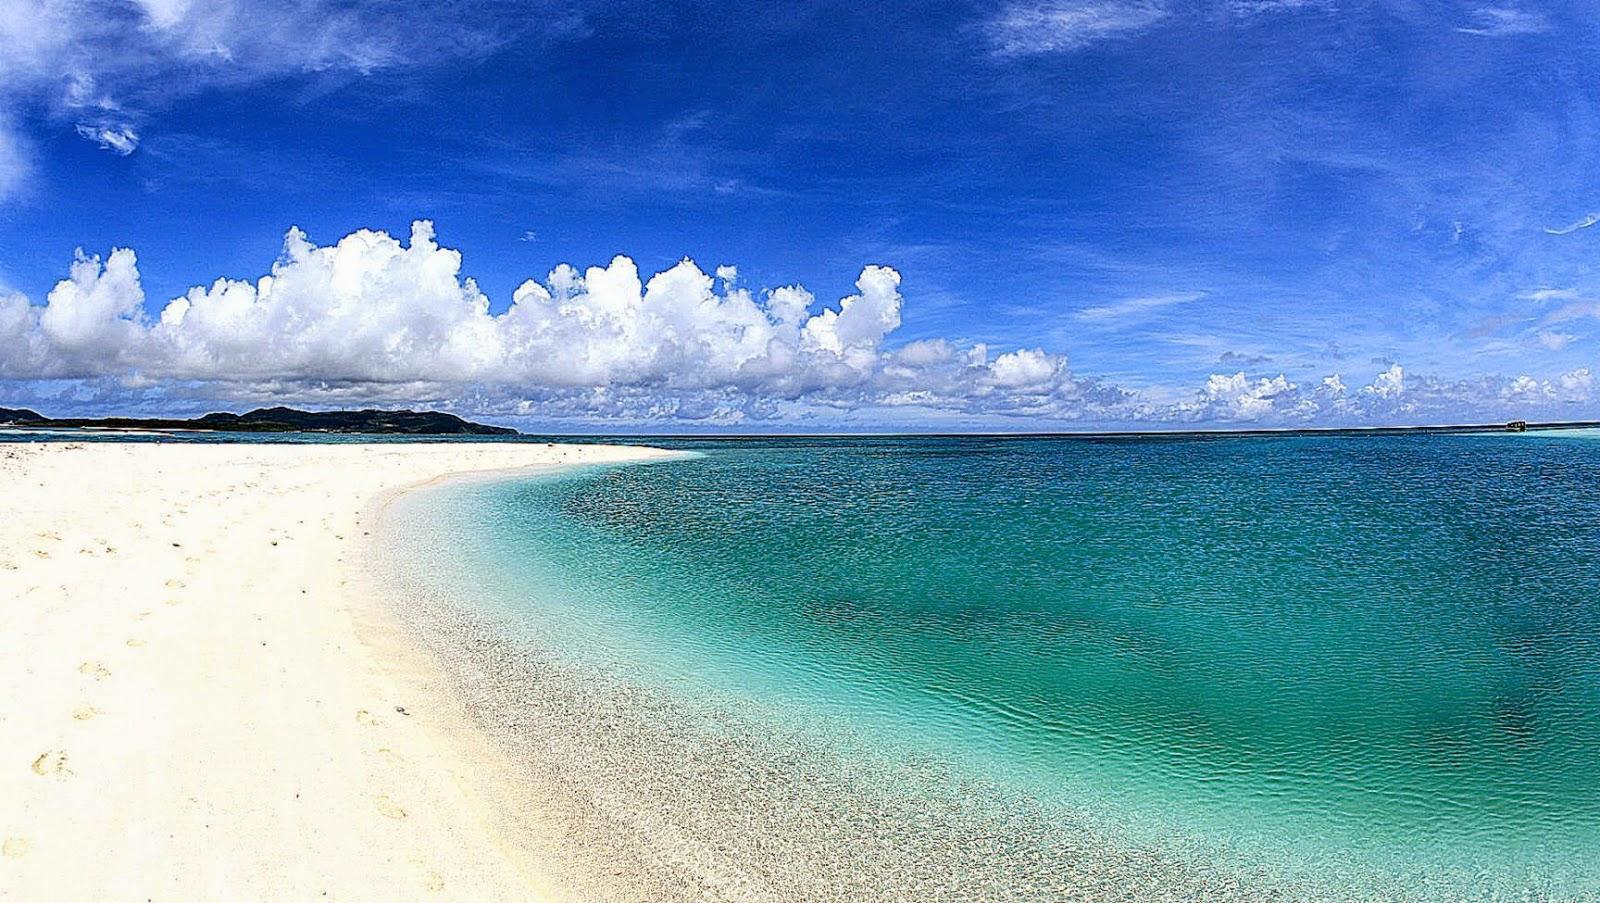 Free Wallpaper Ocean Scenes | Cool HD Wallpapers